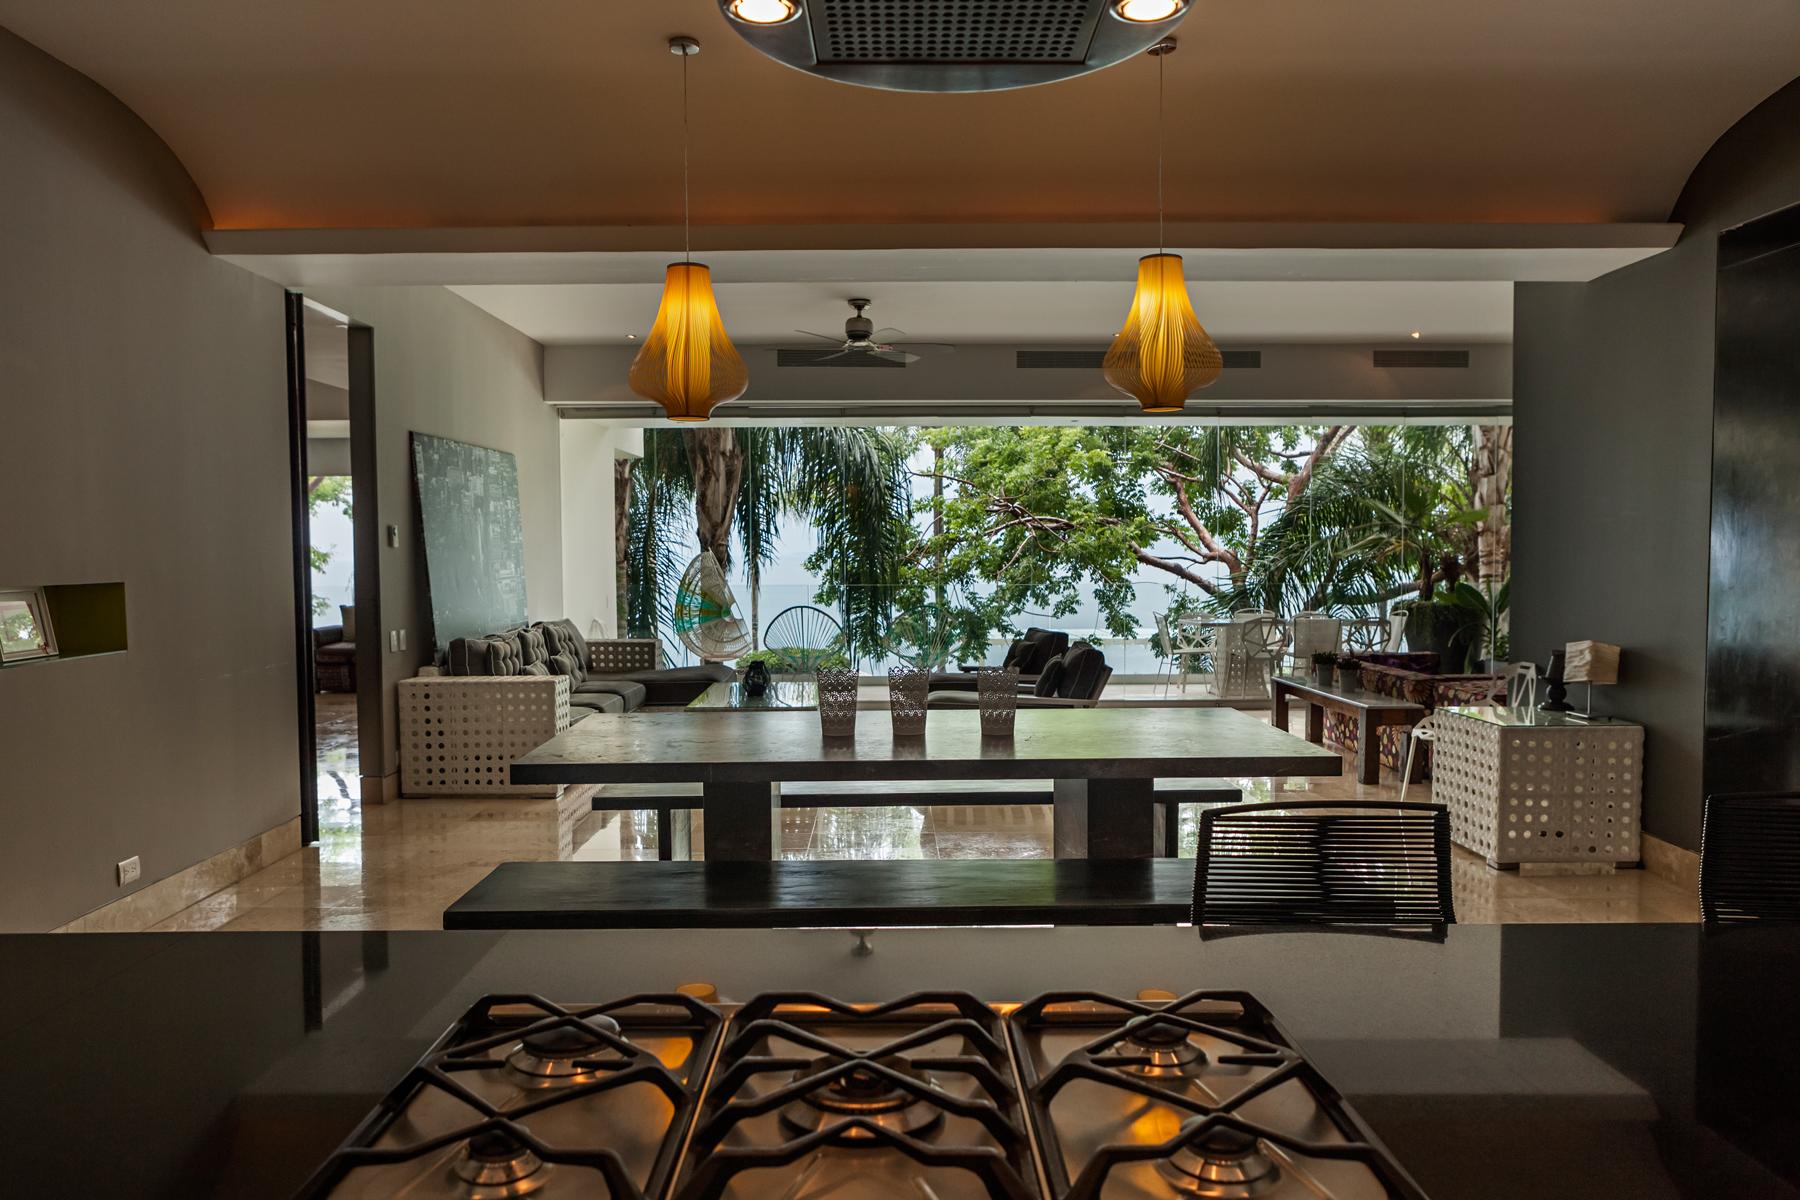 Additional photo for property listing at Avalon 202, Luxury Apartment in Puerto Vallarta Torre Avalon, Depto 202 Calle Gardenias 248 Puerto Vallarta, Jalisco 48399 México